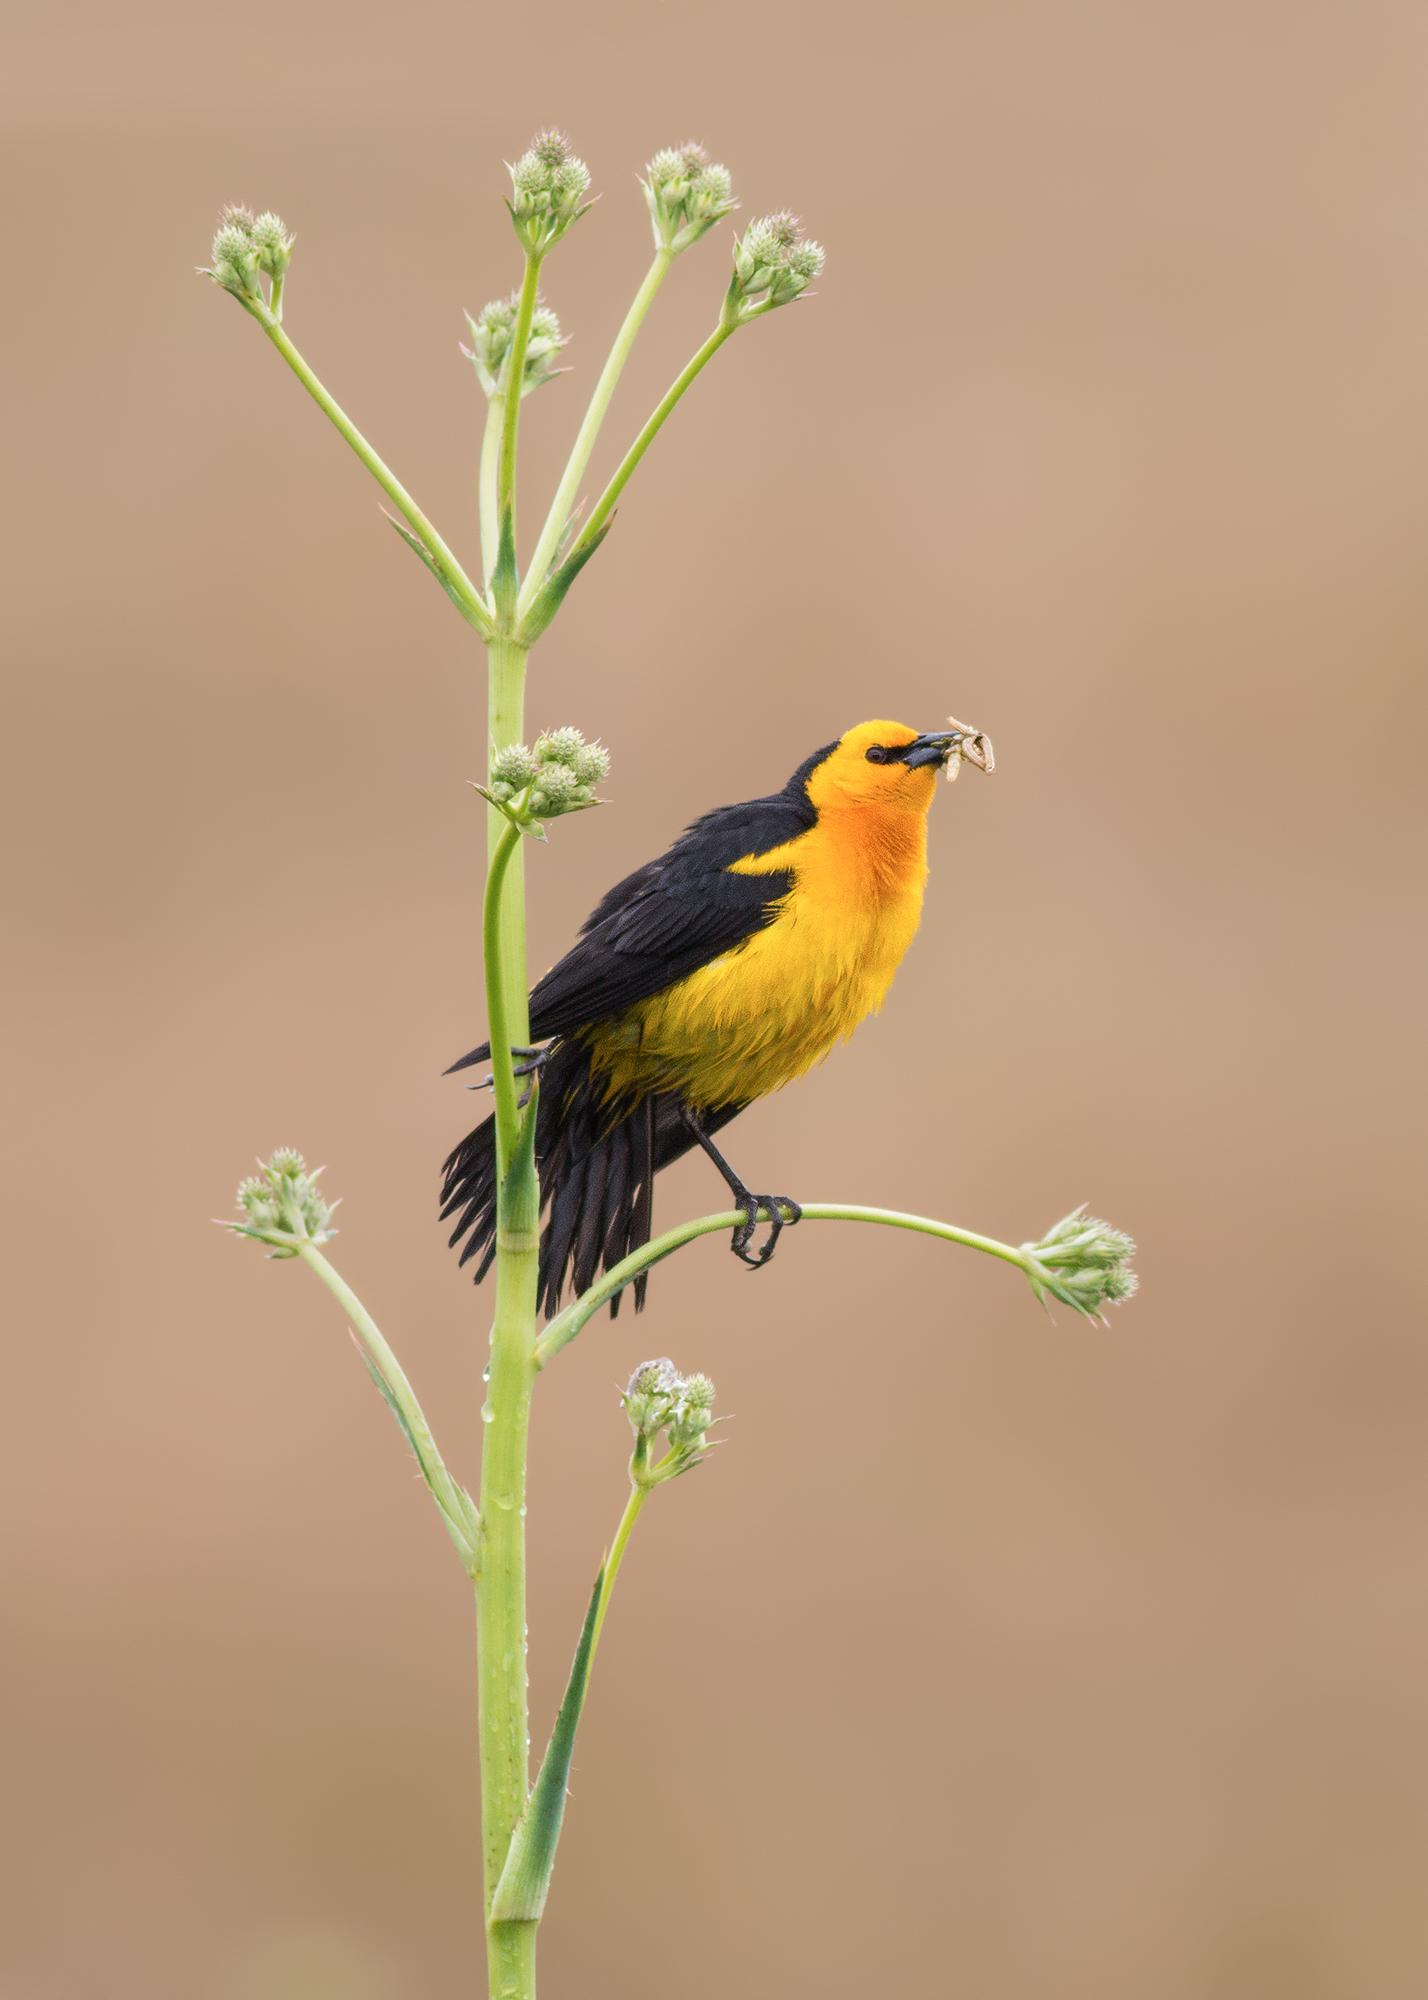 Safron-cowled-Blackbird-JPEG_web 3.jpg